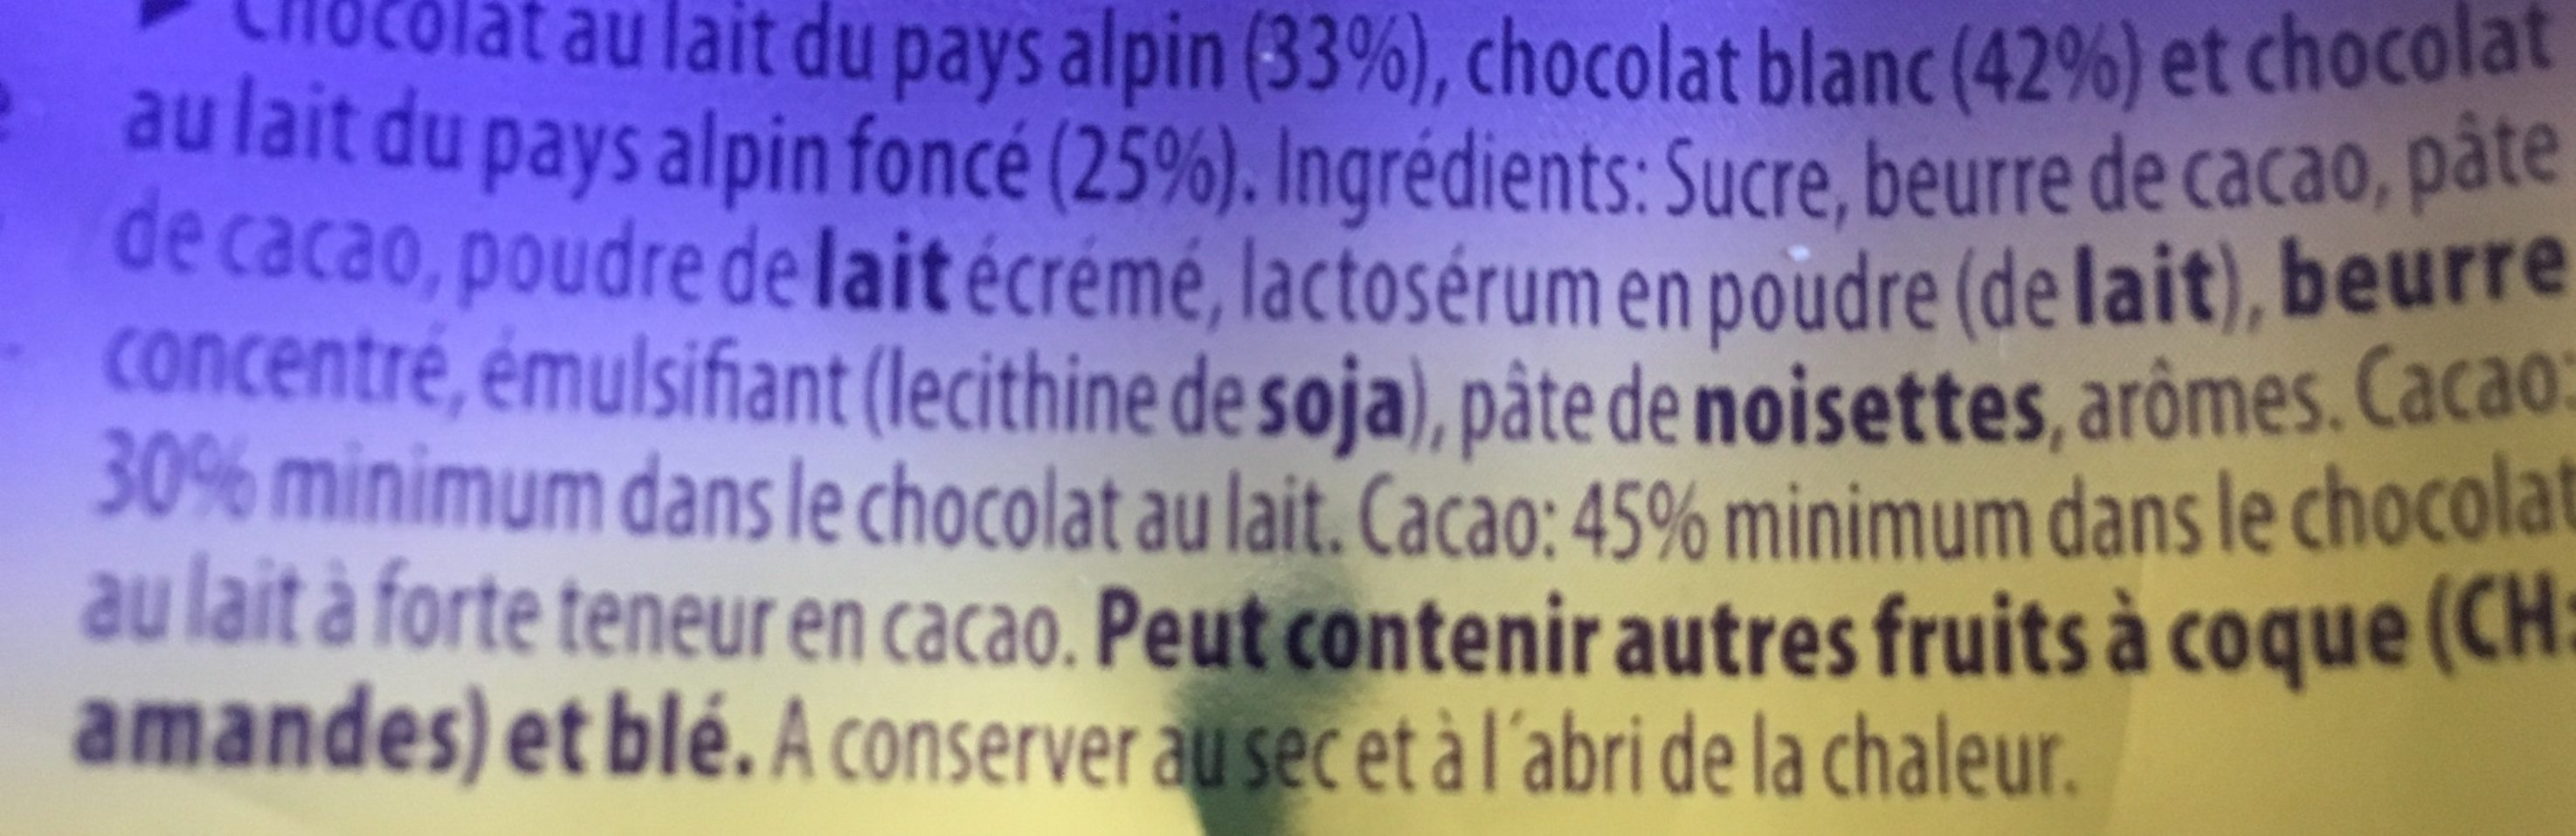 Milka Chocolat Triolade - Ingrédients - fr